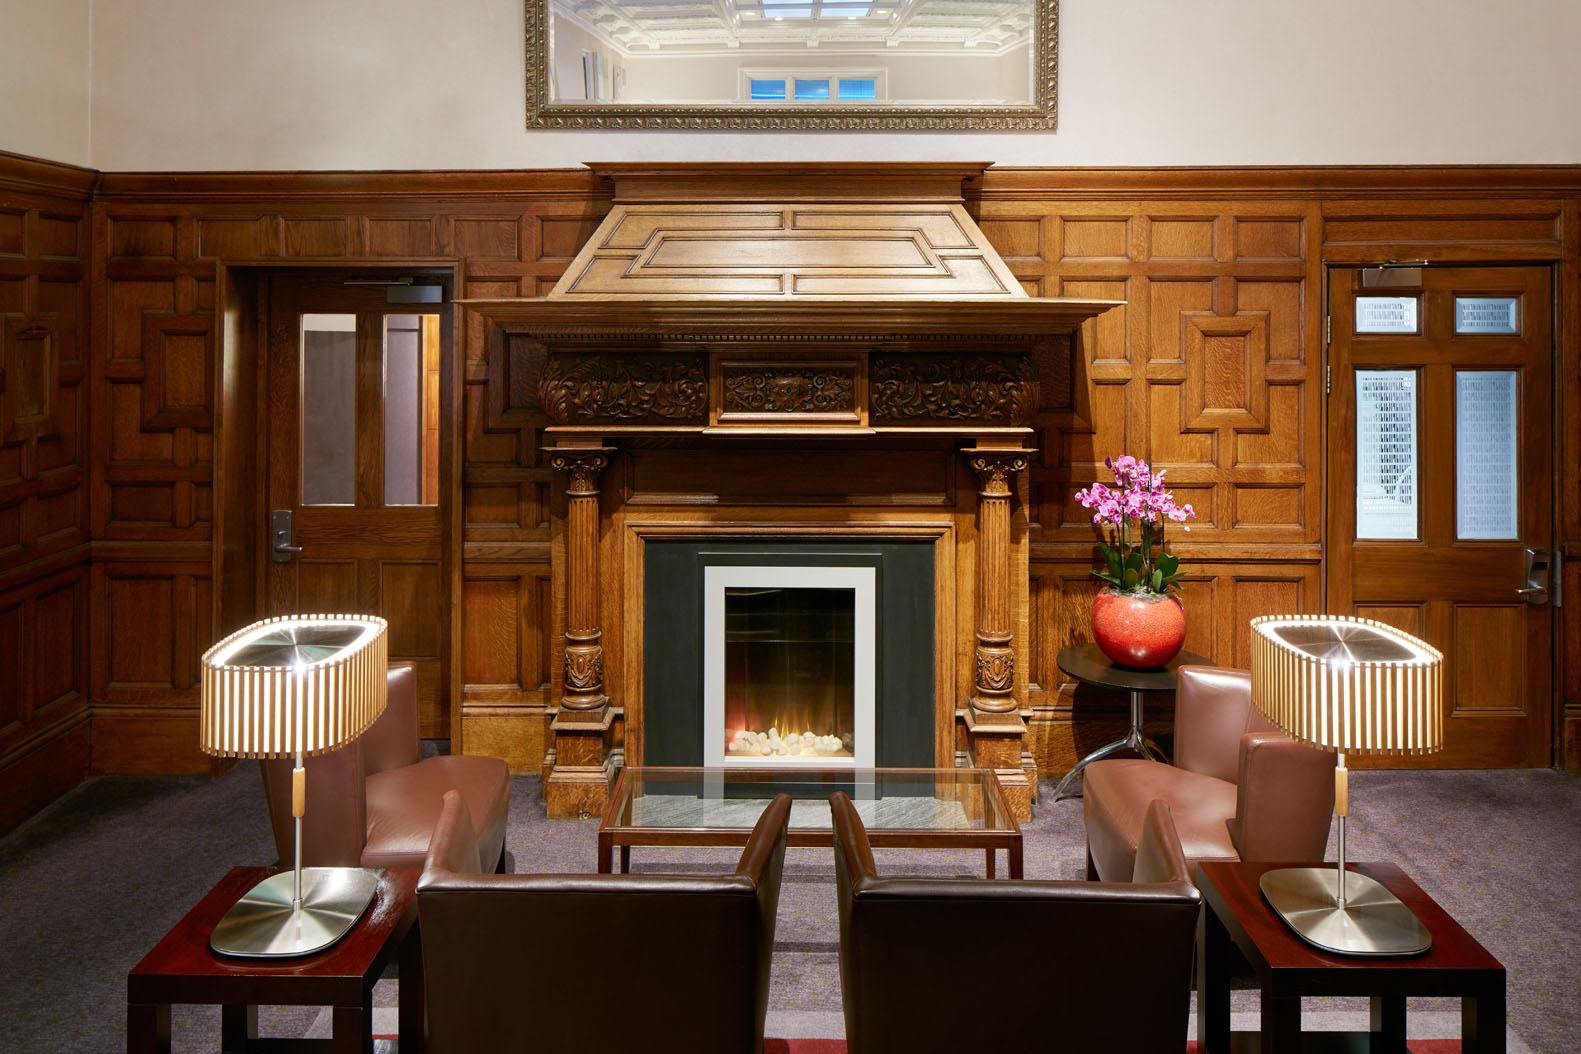 Club Quarters Hotel Trafalgar Square  Business Hotel in